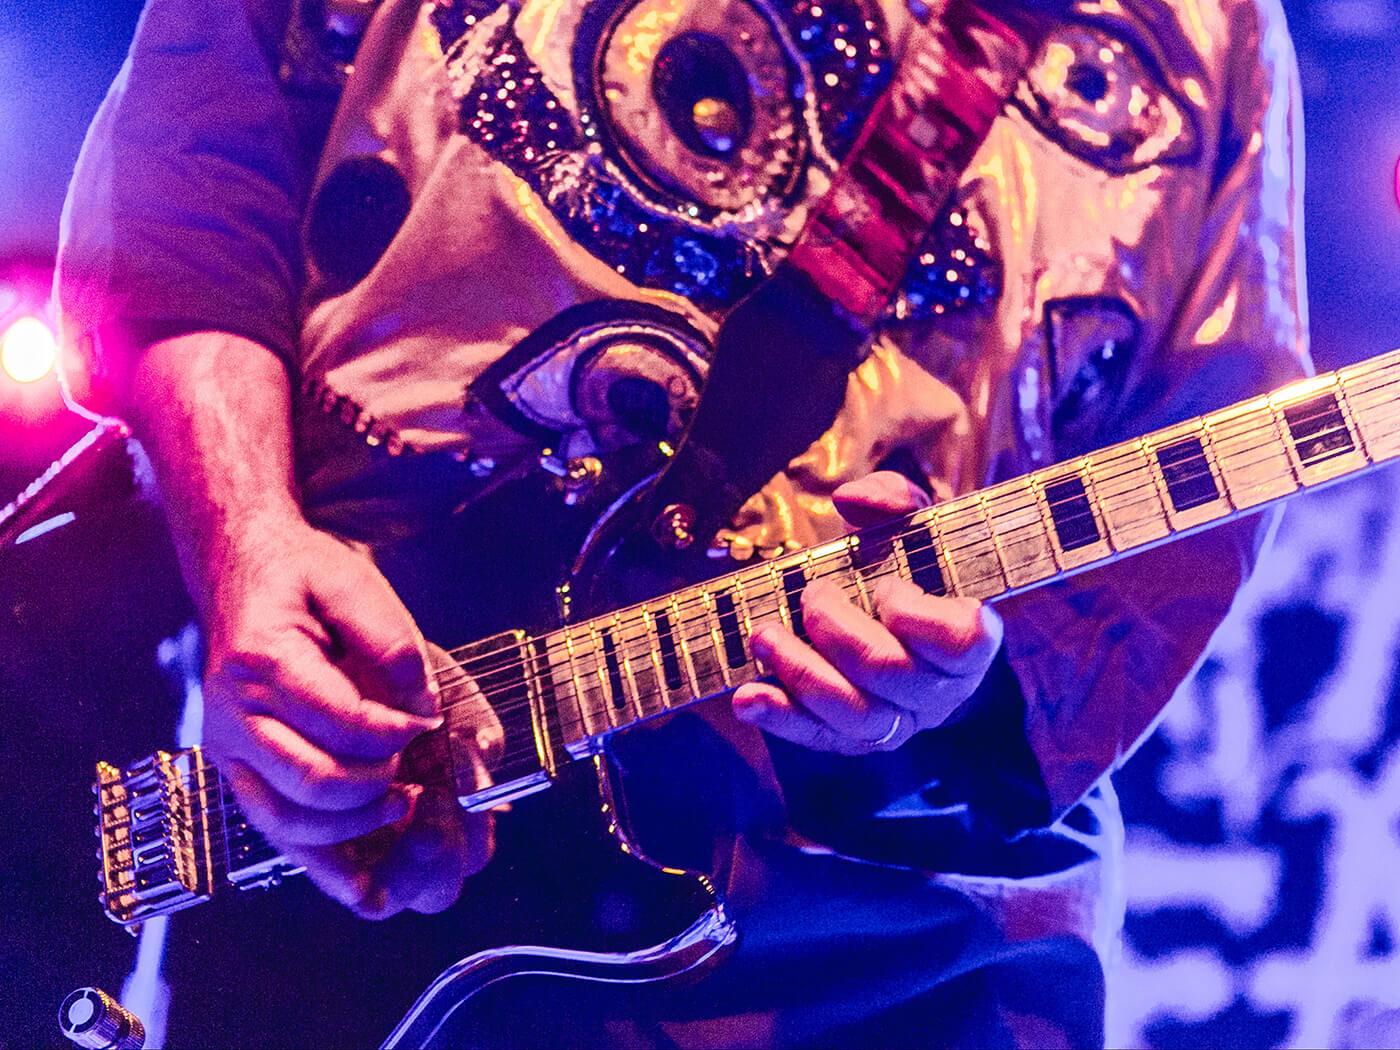 Buzz Osborne's Electric Guitar Company